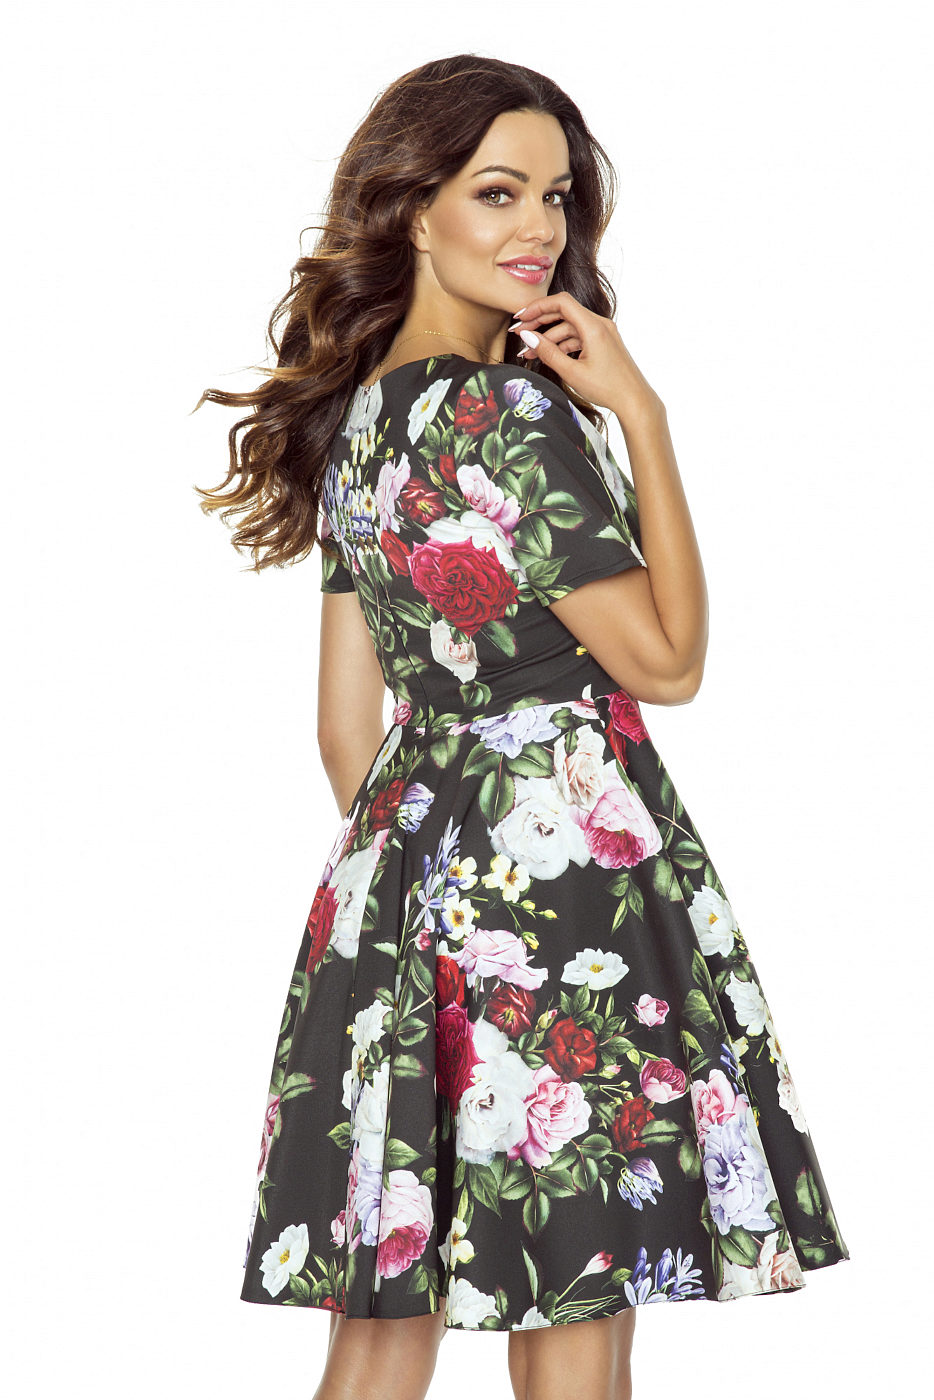 981e8831f55 Květované šaty se spodničkou Kartes Trinity Kartes